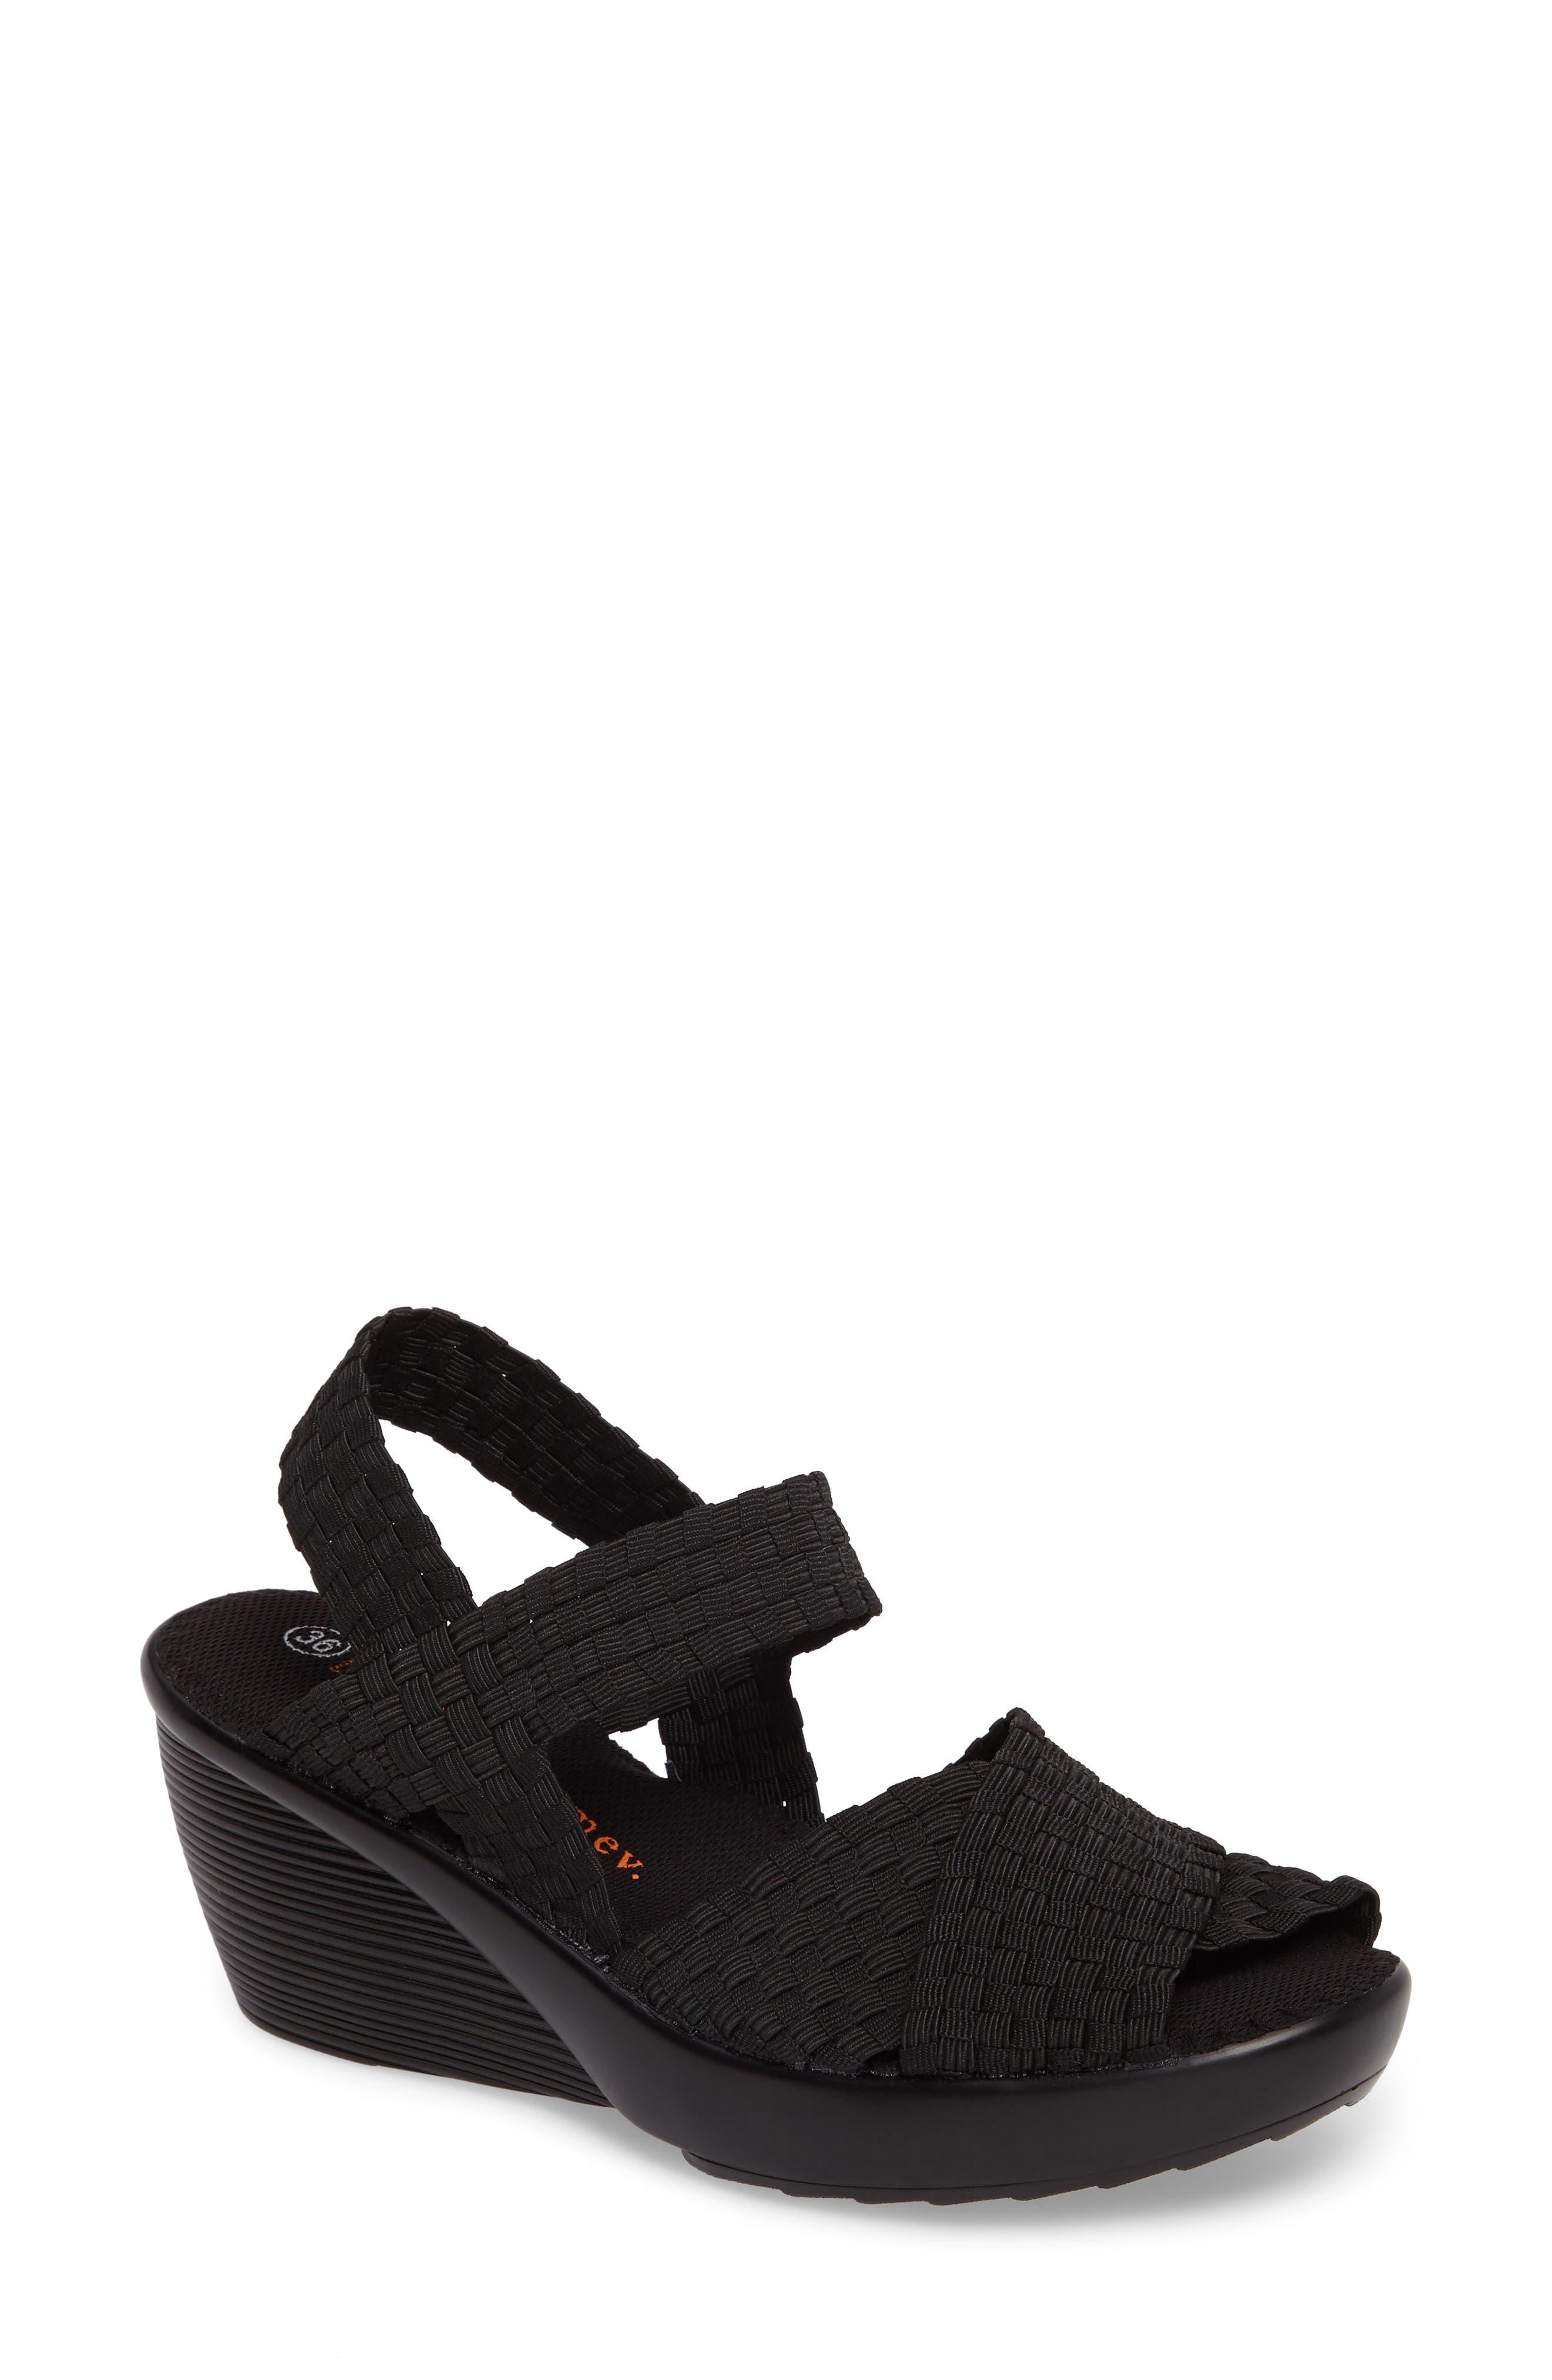 Fresh Buttercup Sandal,                         Main,                         color, BLACK FABRIC